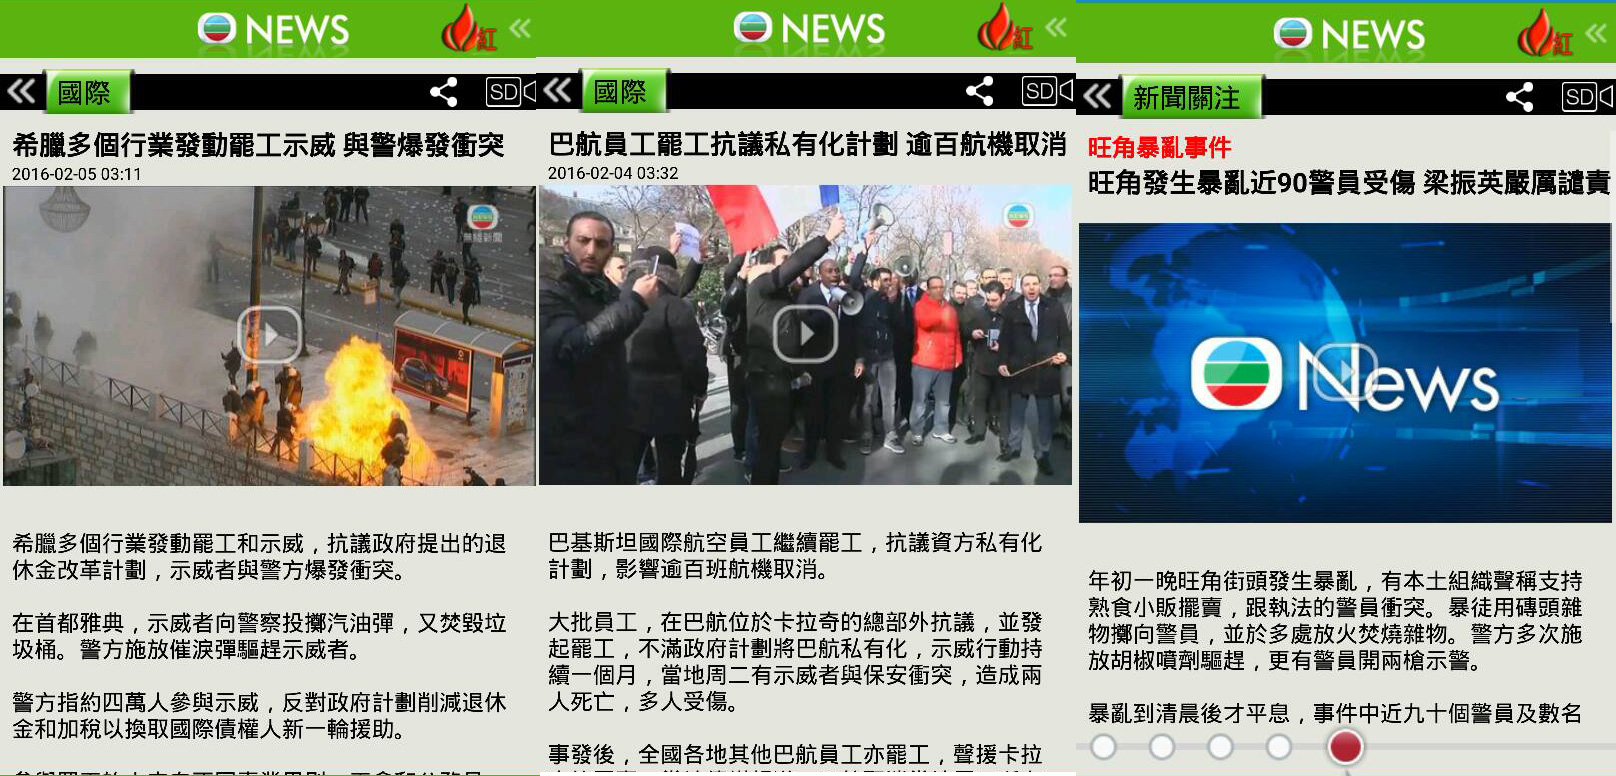 [img]http://www.passiontimes.hk/uploads/images/201602/20160209tvb_1.jpg[/img]